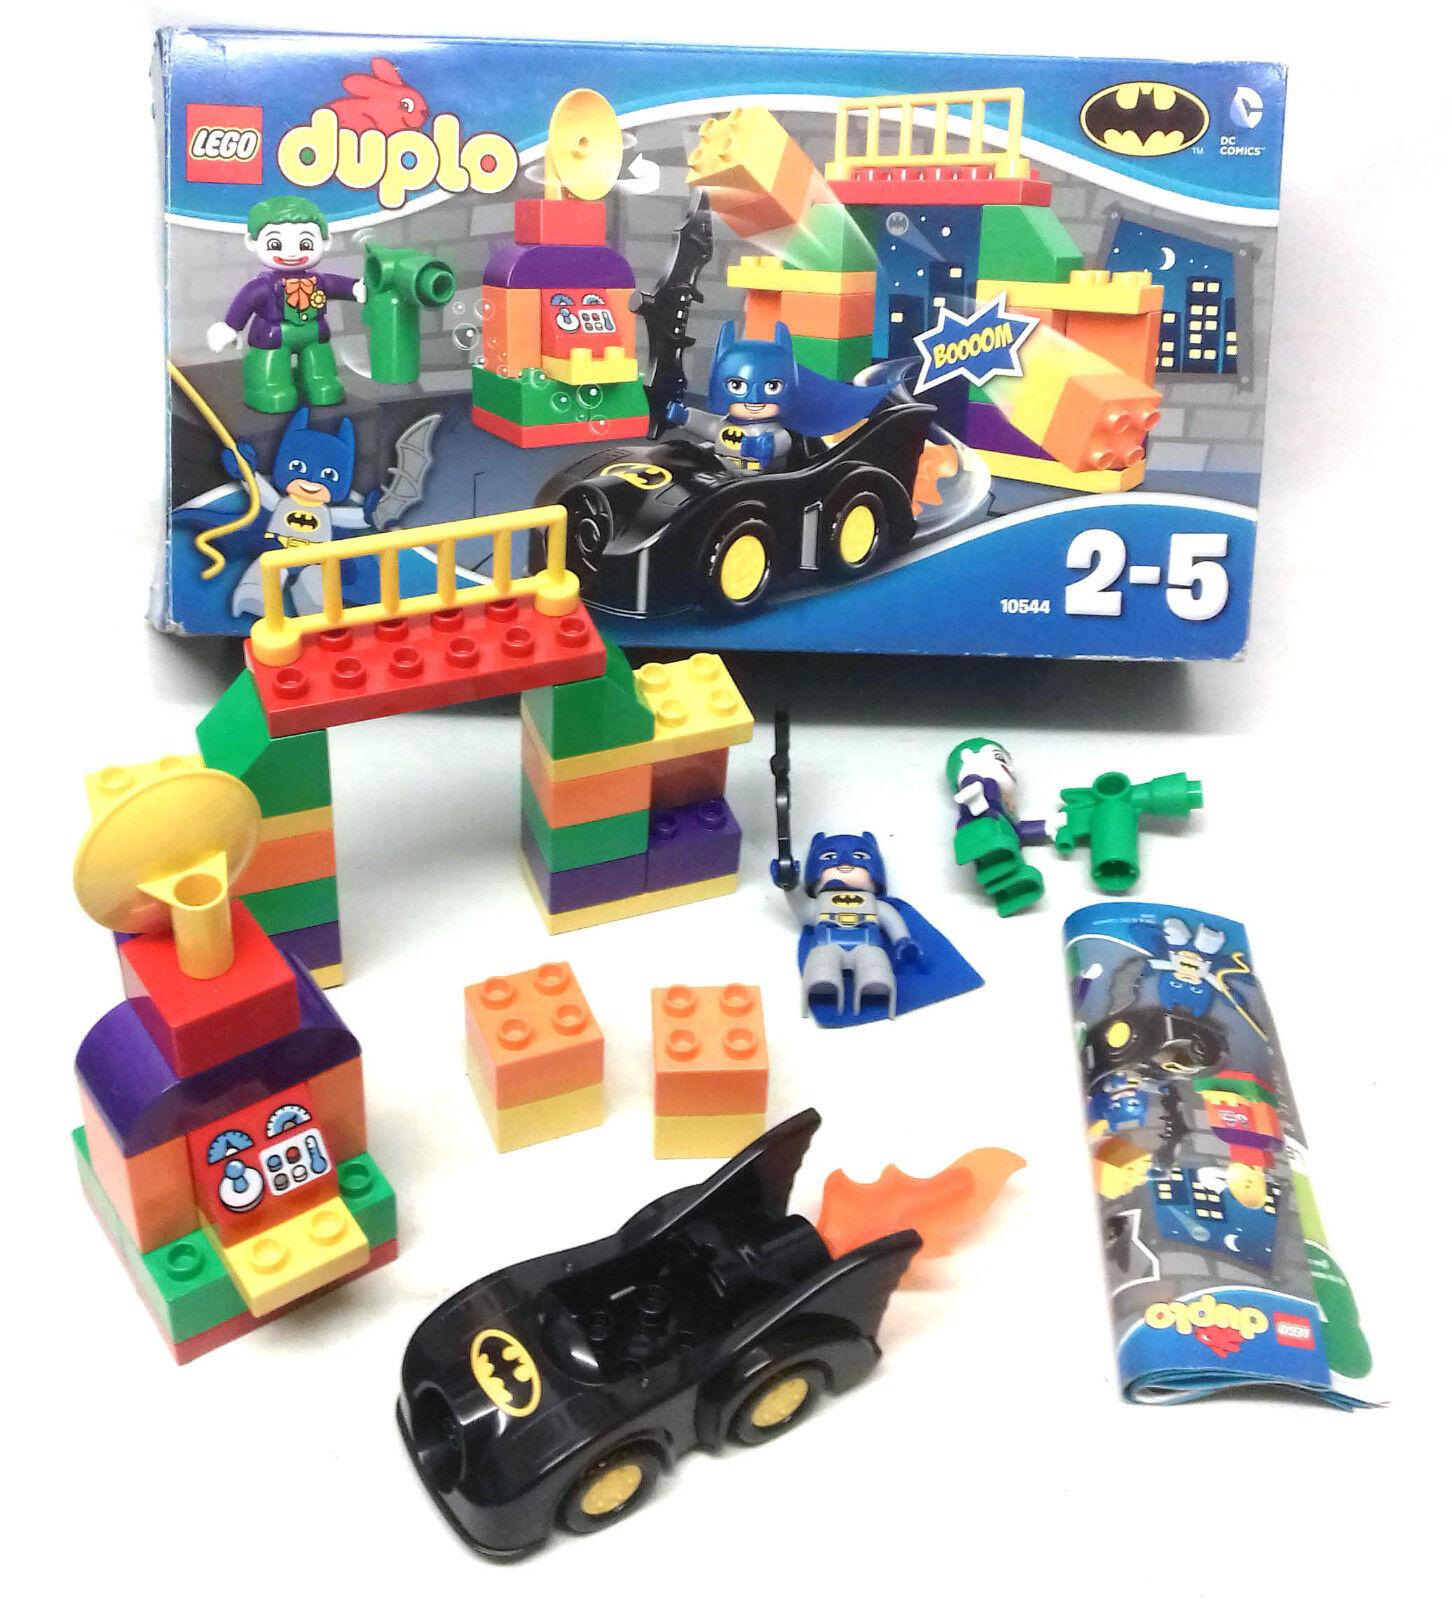 Lego duplo - spielzeug hat 10554 batman joker - zahlen, batcar usw. mit box - alter -